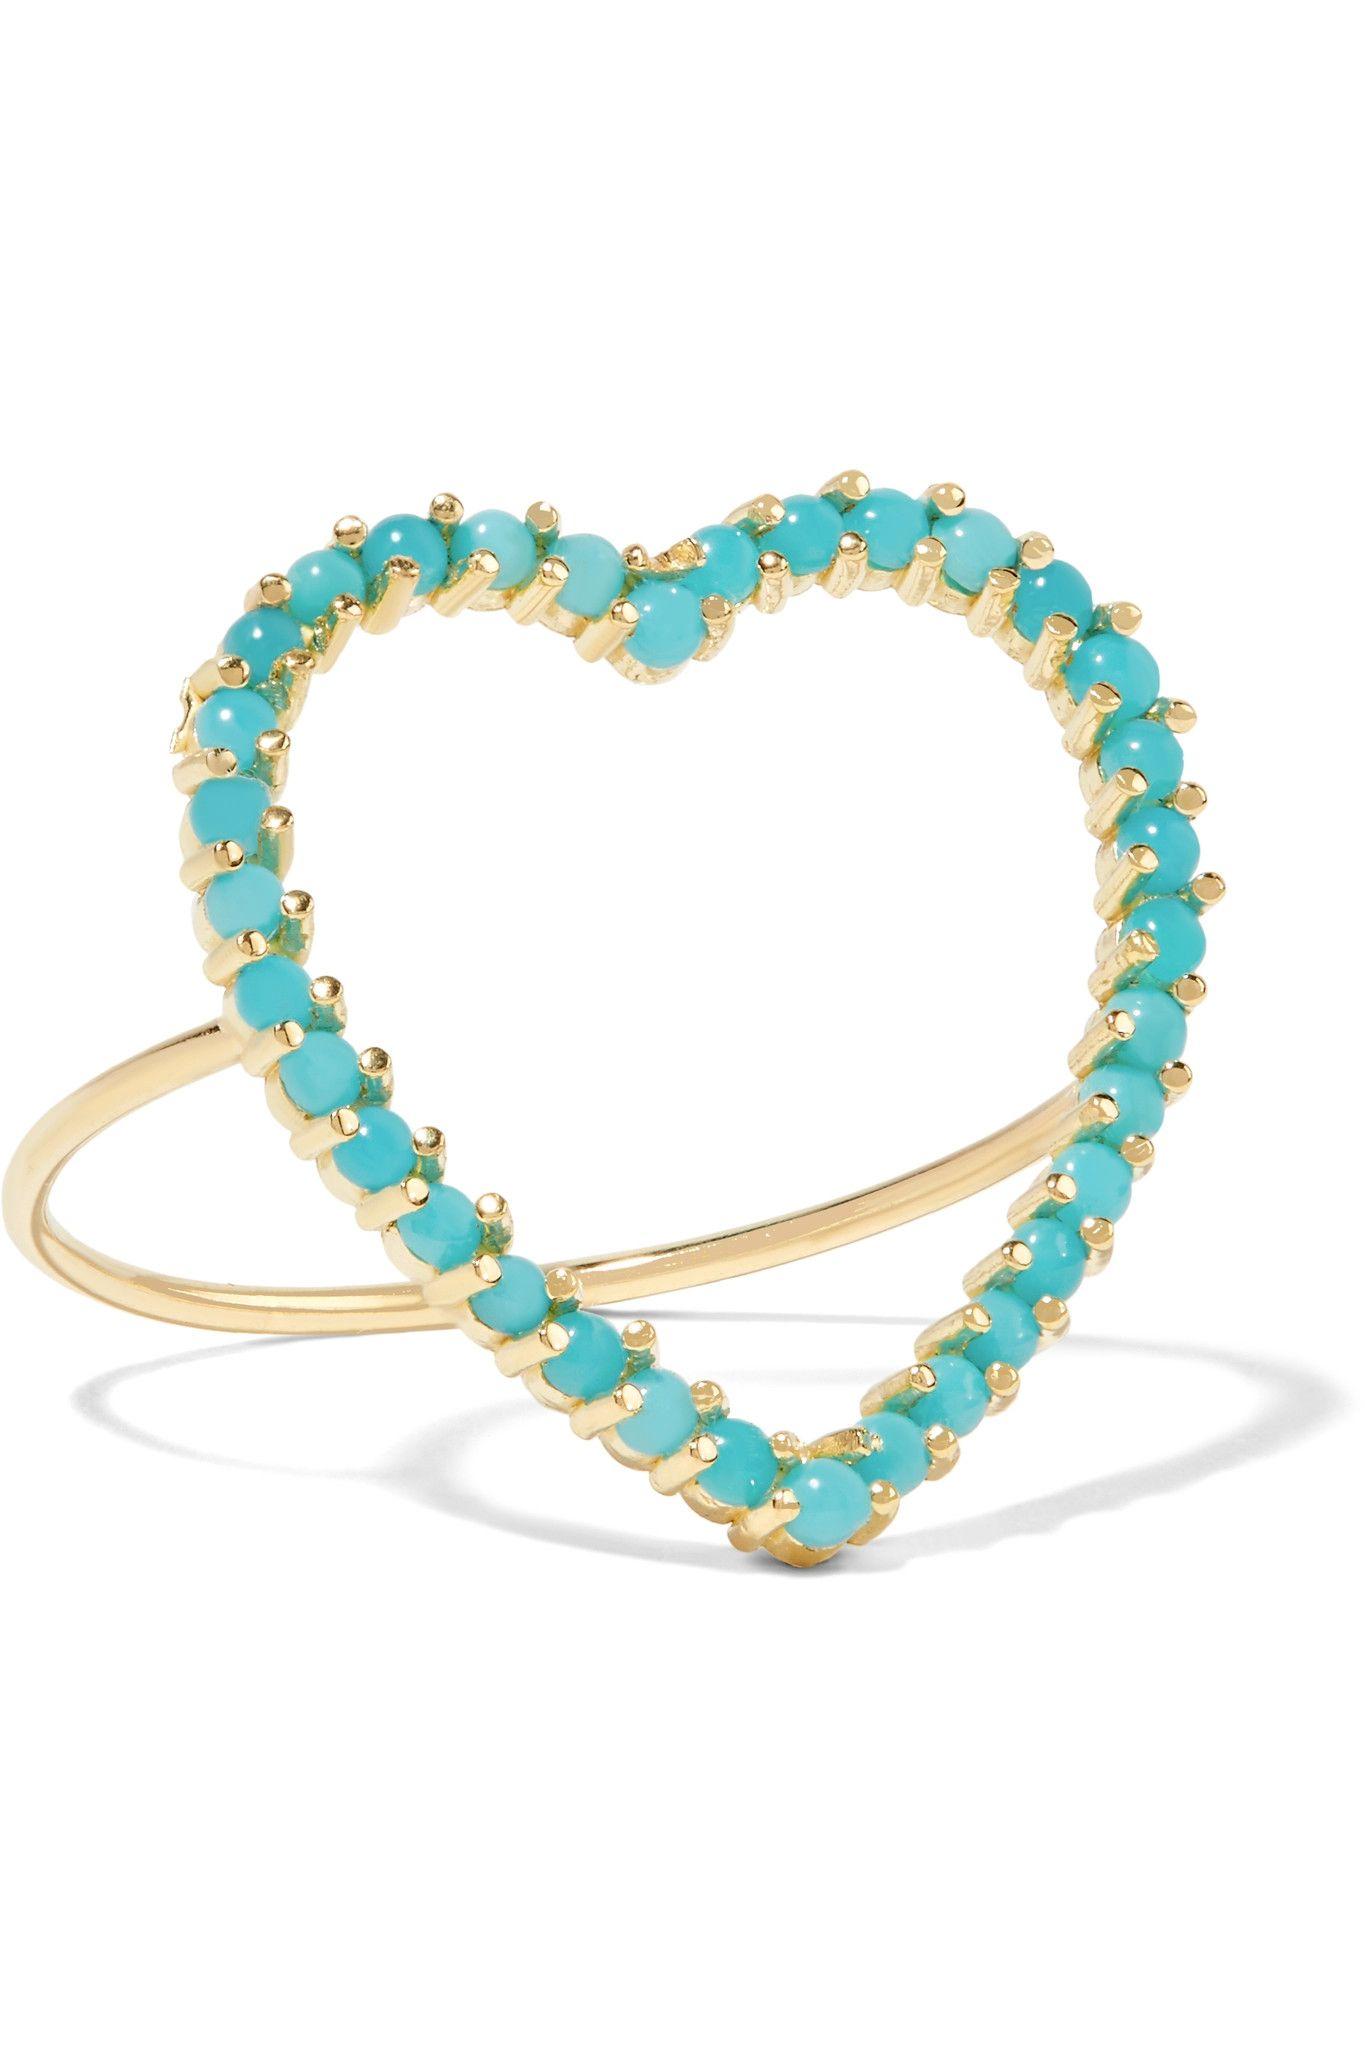 Jennifer Meyer Heart 18-karat Gold Turquoise Earrings 9TVK0